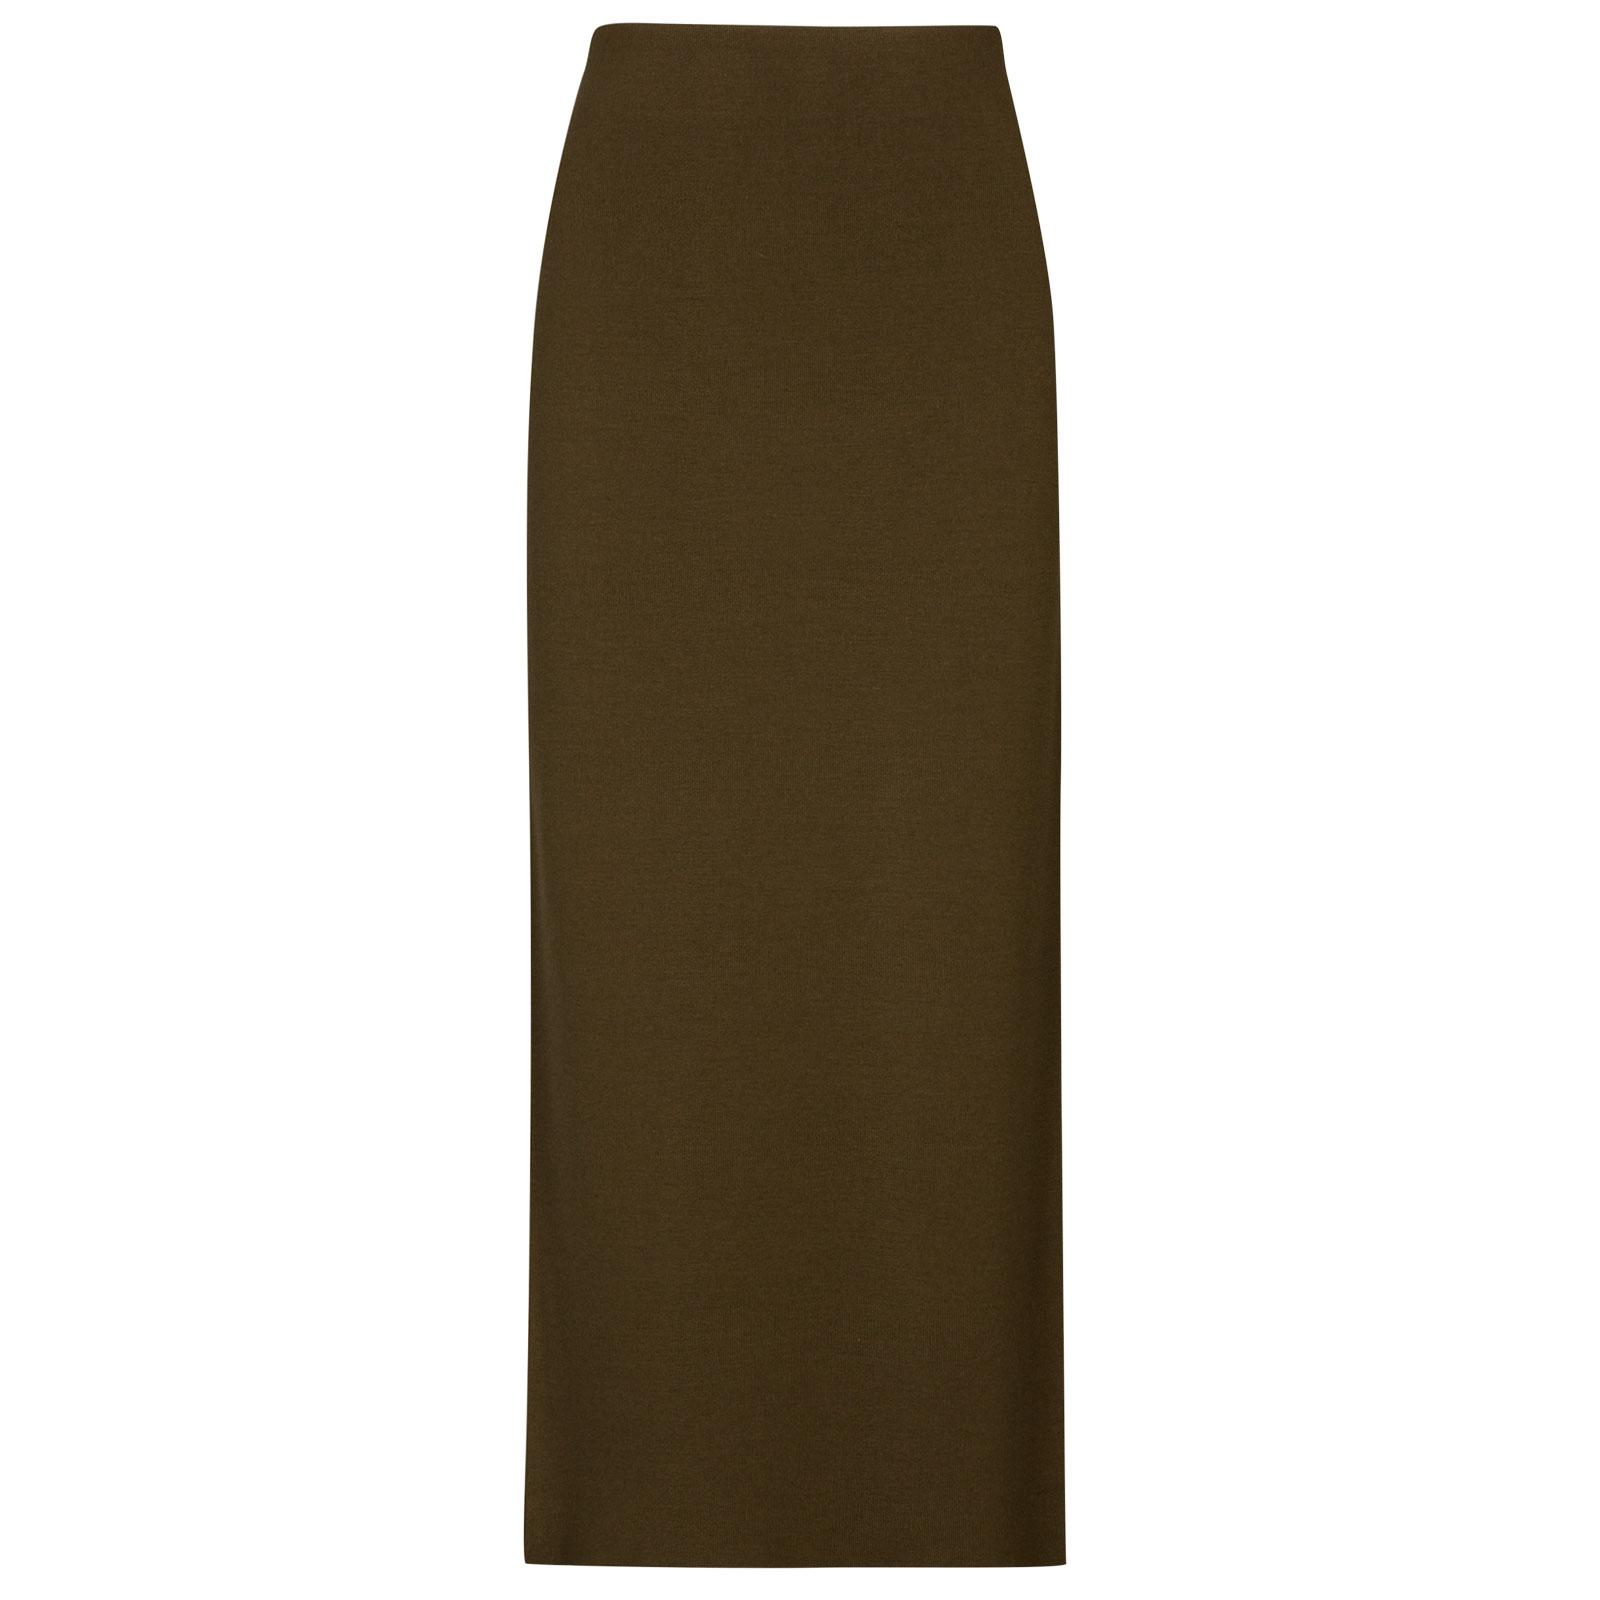 John Smedley moran Merino Wool Skirt in Kielder Green-M